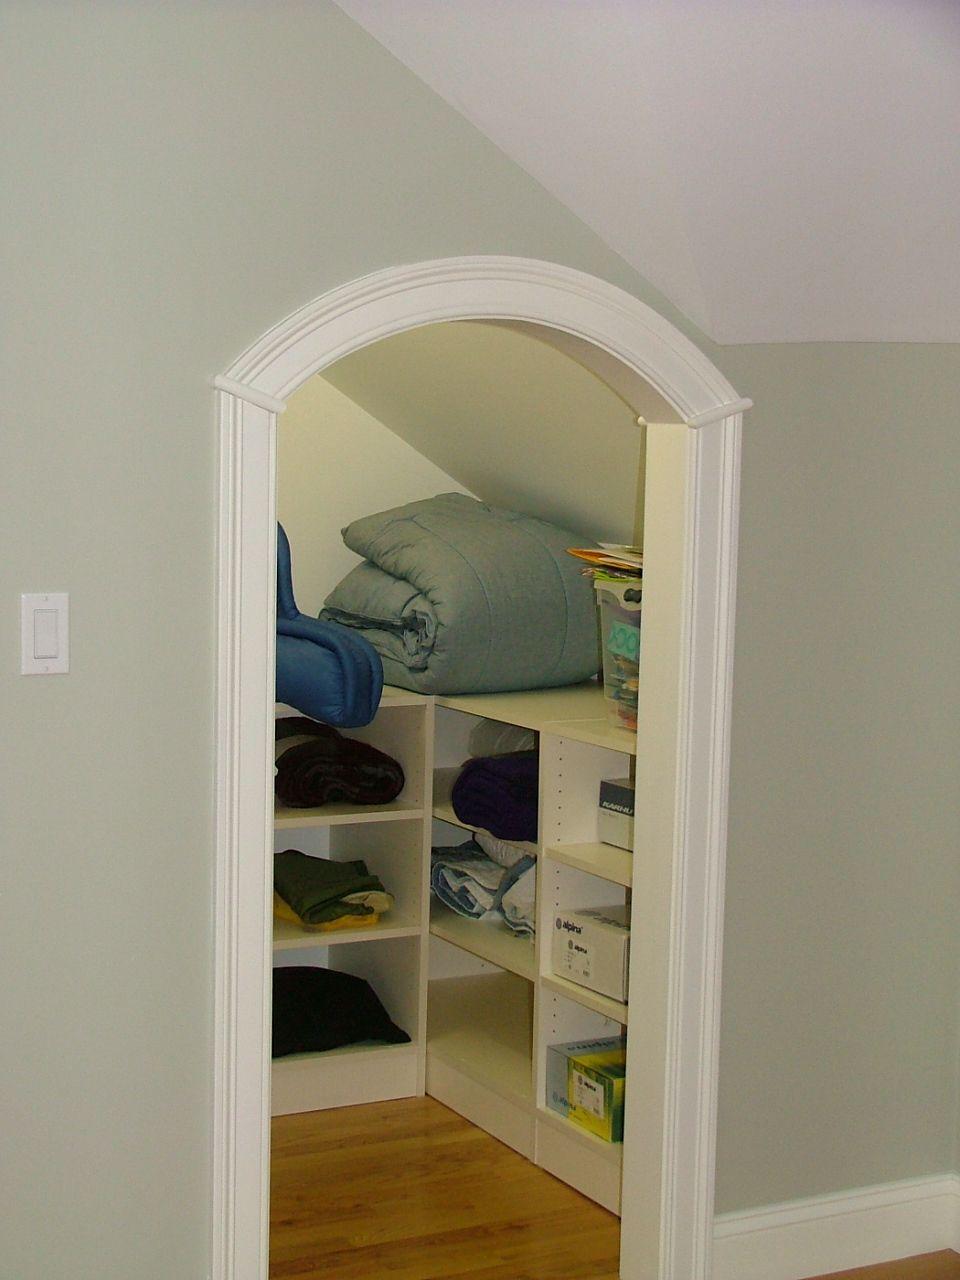 Pin By Closetplace Llc On Closets With Angled Ceilings Attic Renovation Attic Flooring Small Attics